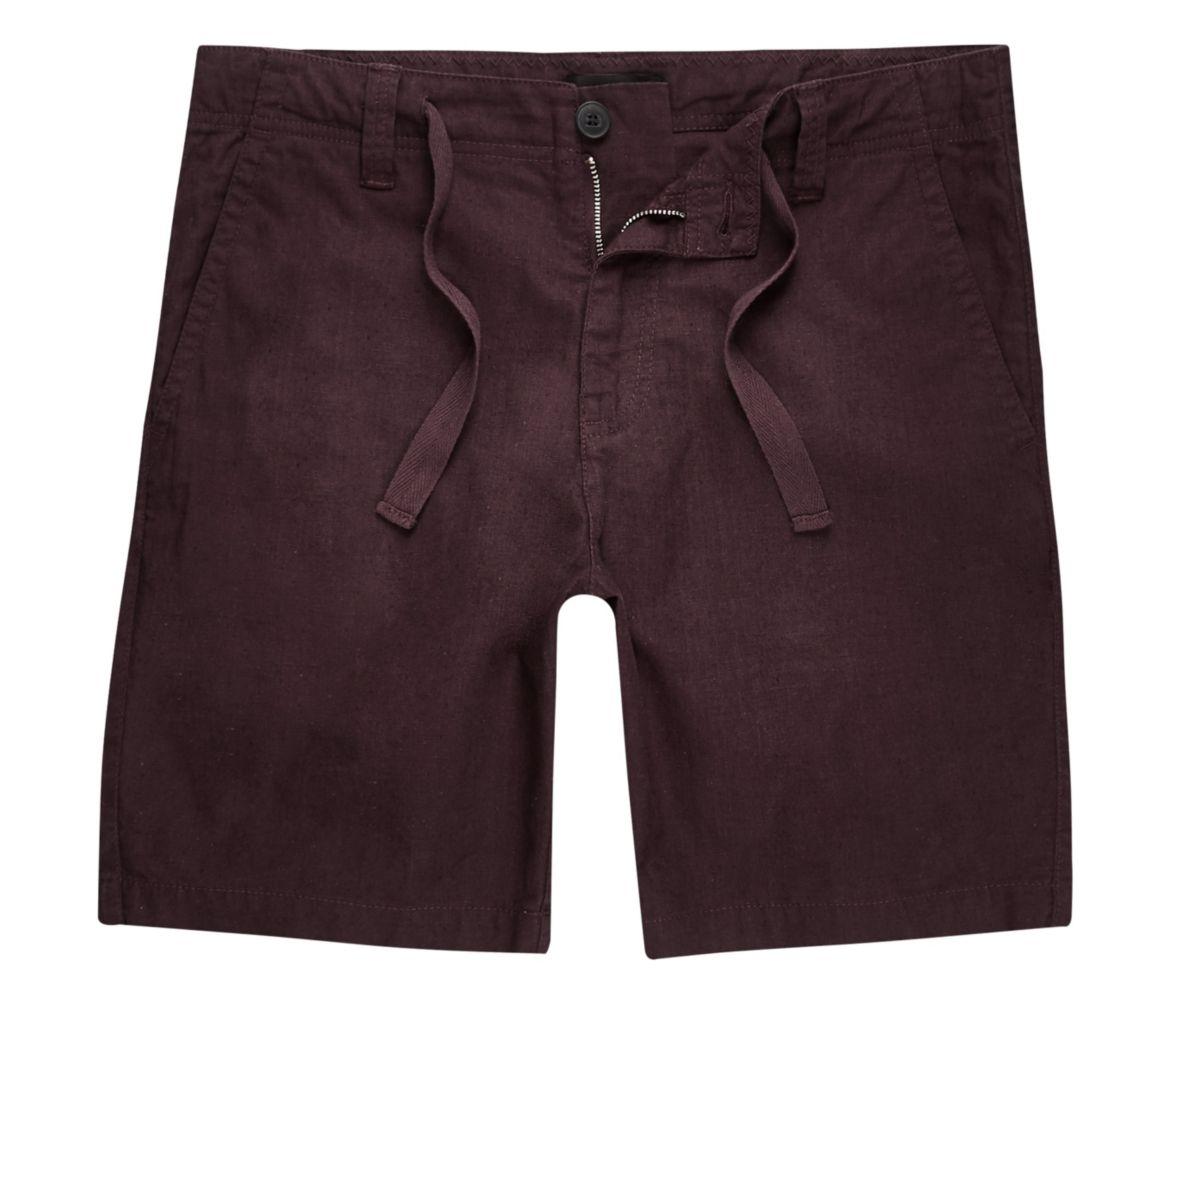 Burgundy red linen blend shorts